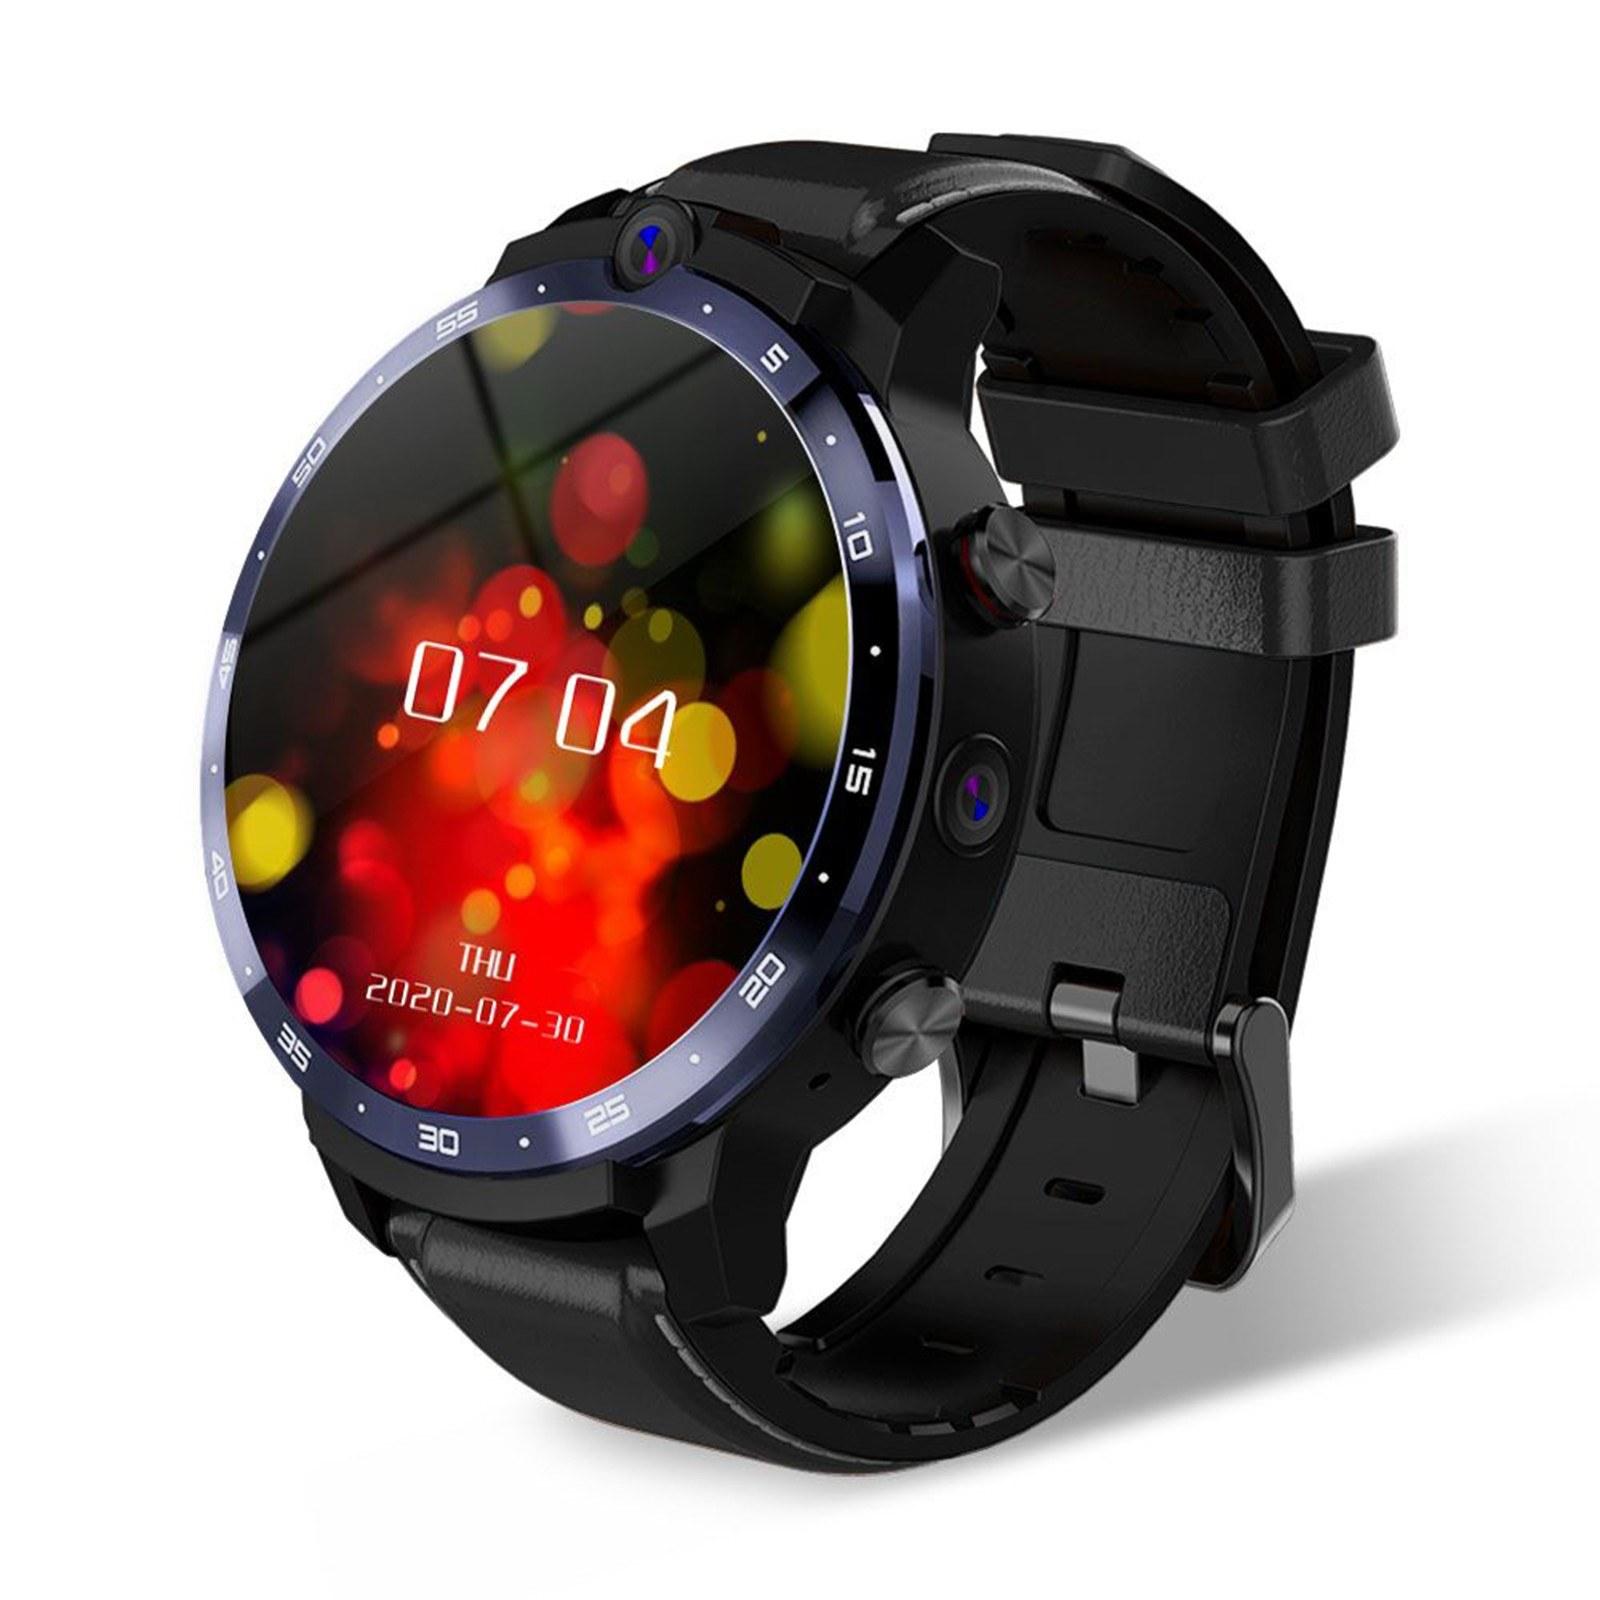 cafago.com - 61% OFF LEMFO LEM12 Pro 4G LTE Smart Watch,free shipping+$187.81